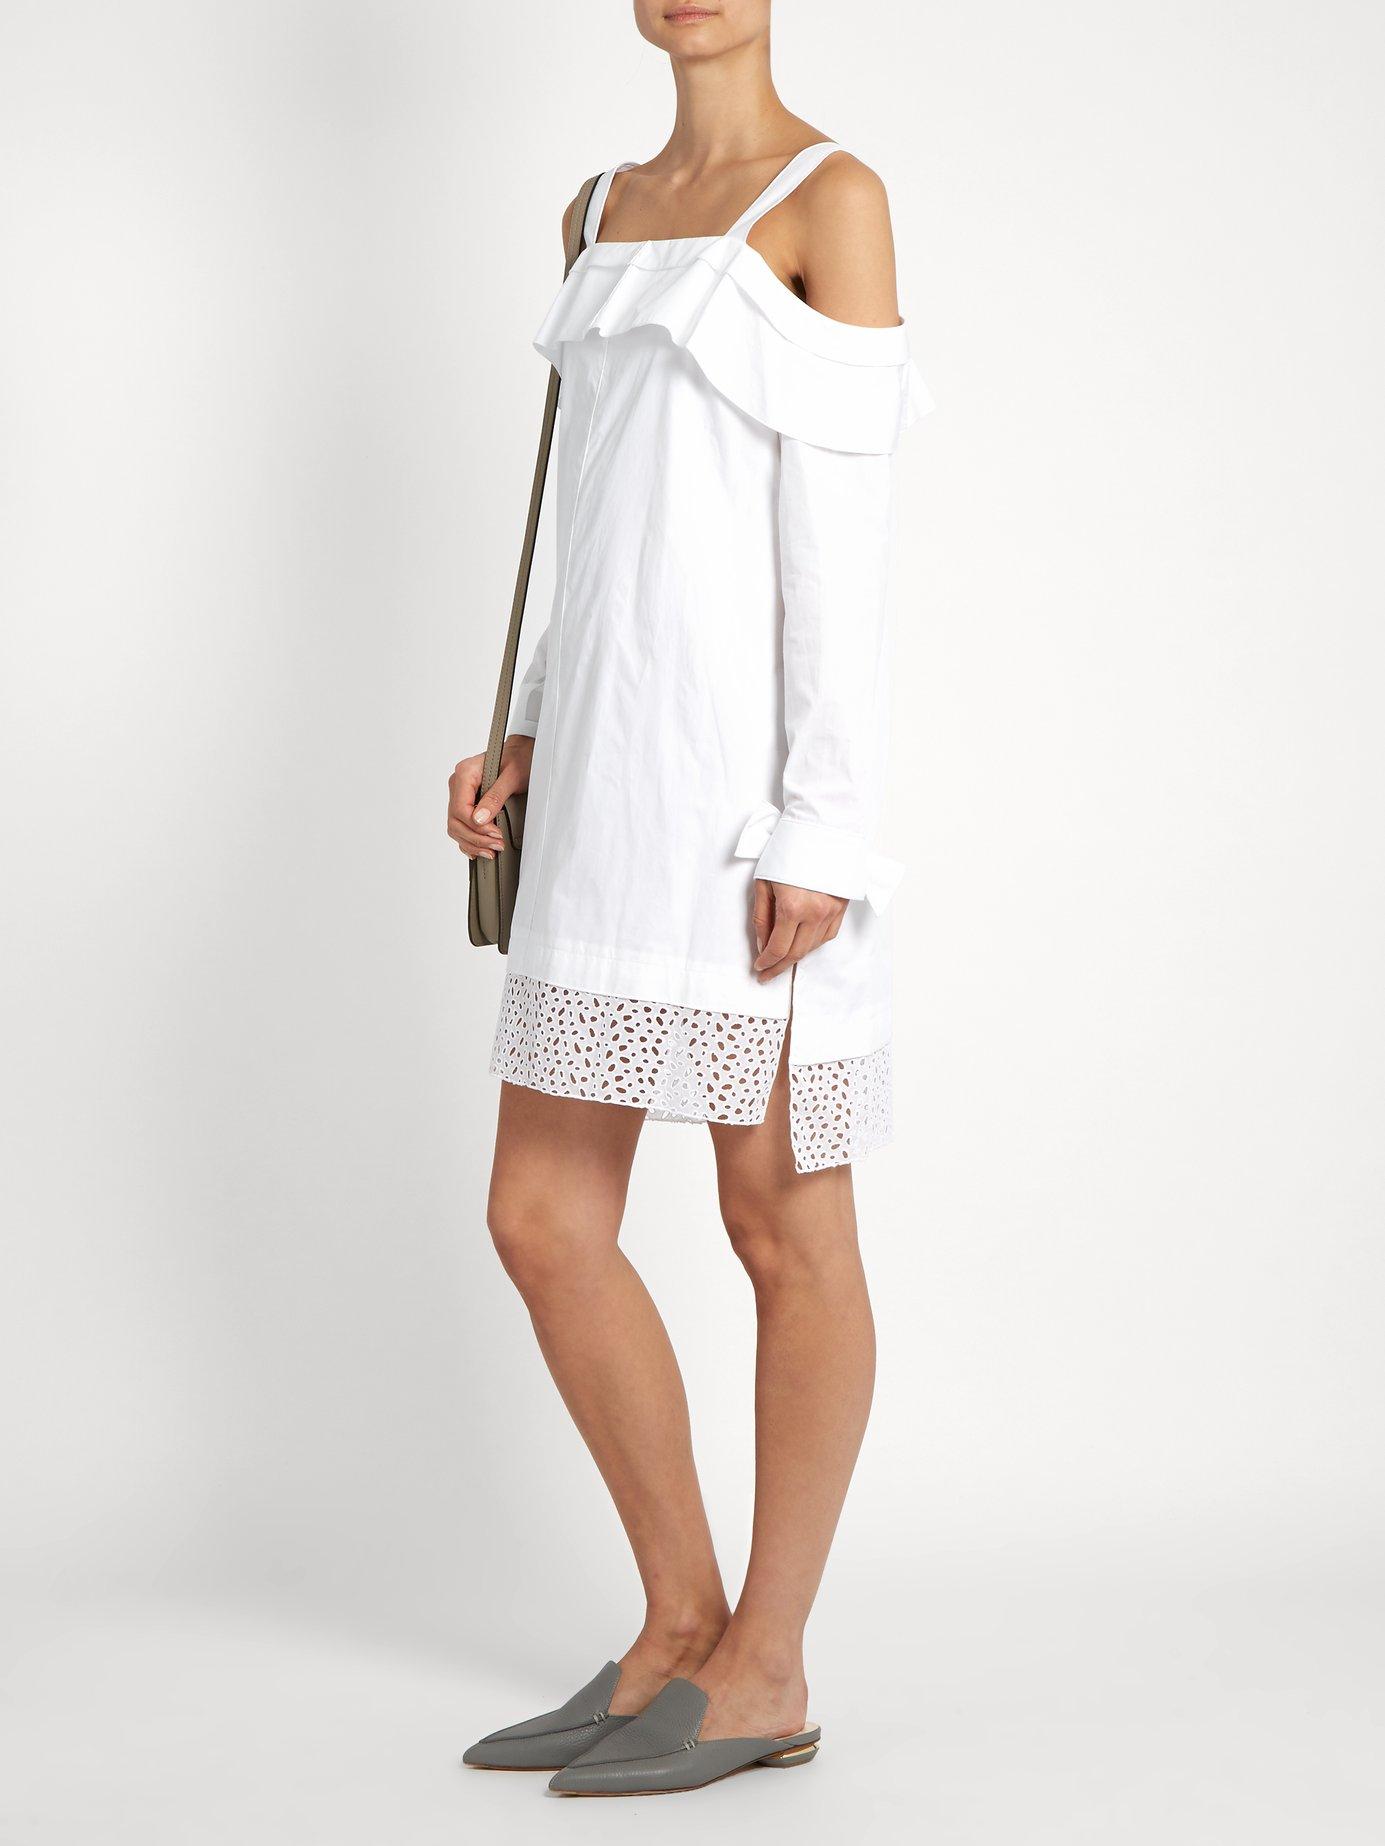 Off-the-shoulder cotton-poplin dress by Proenza Schouler